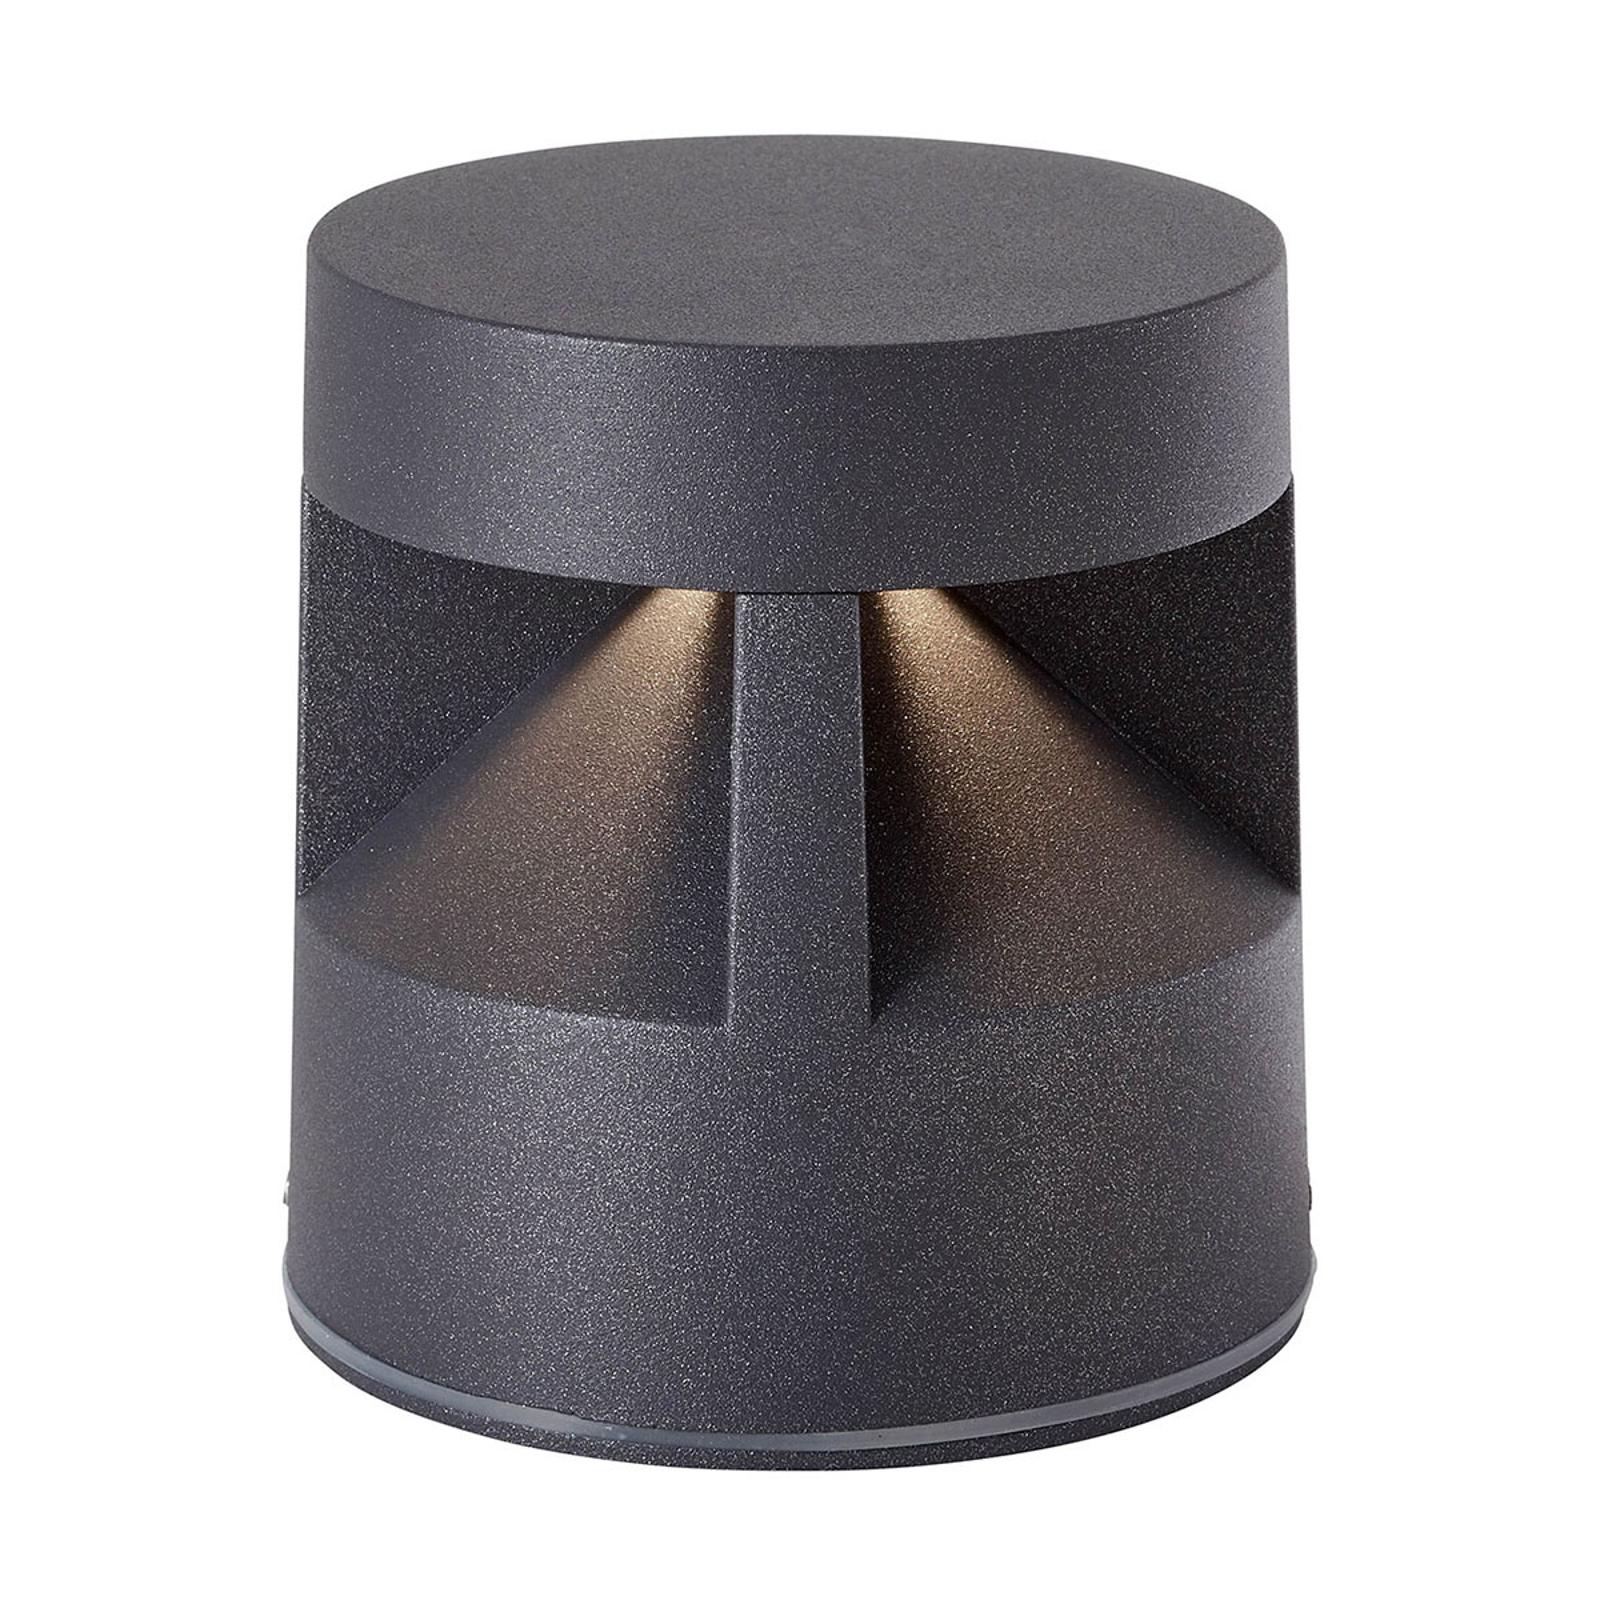 AEG Winslow lampioncino LED altezza 11,5 cm